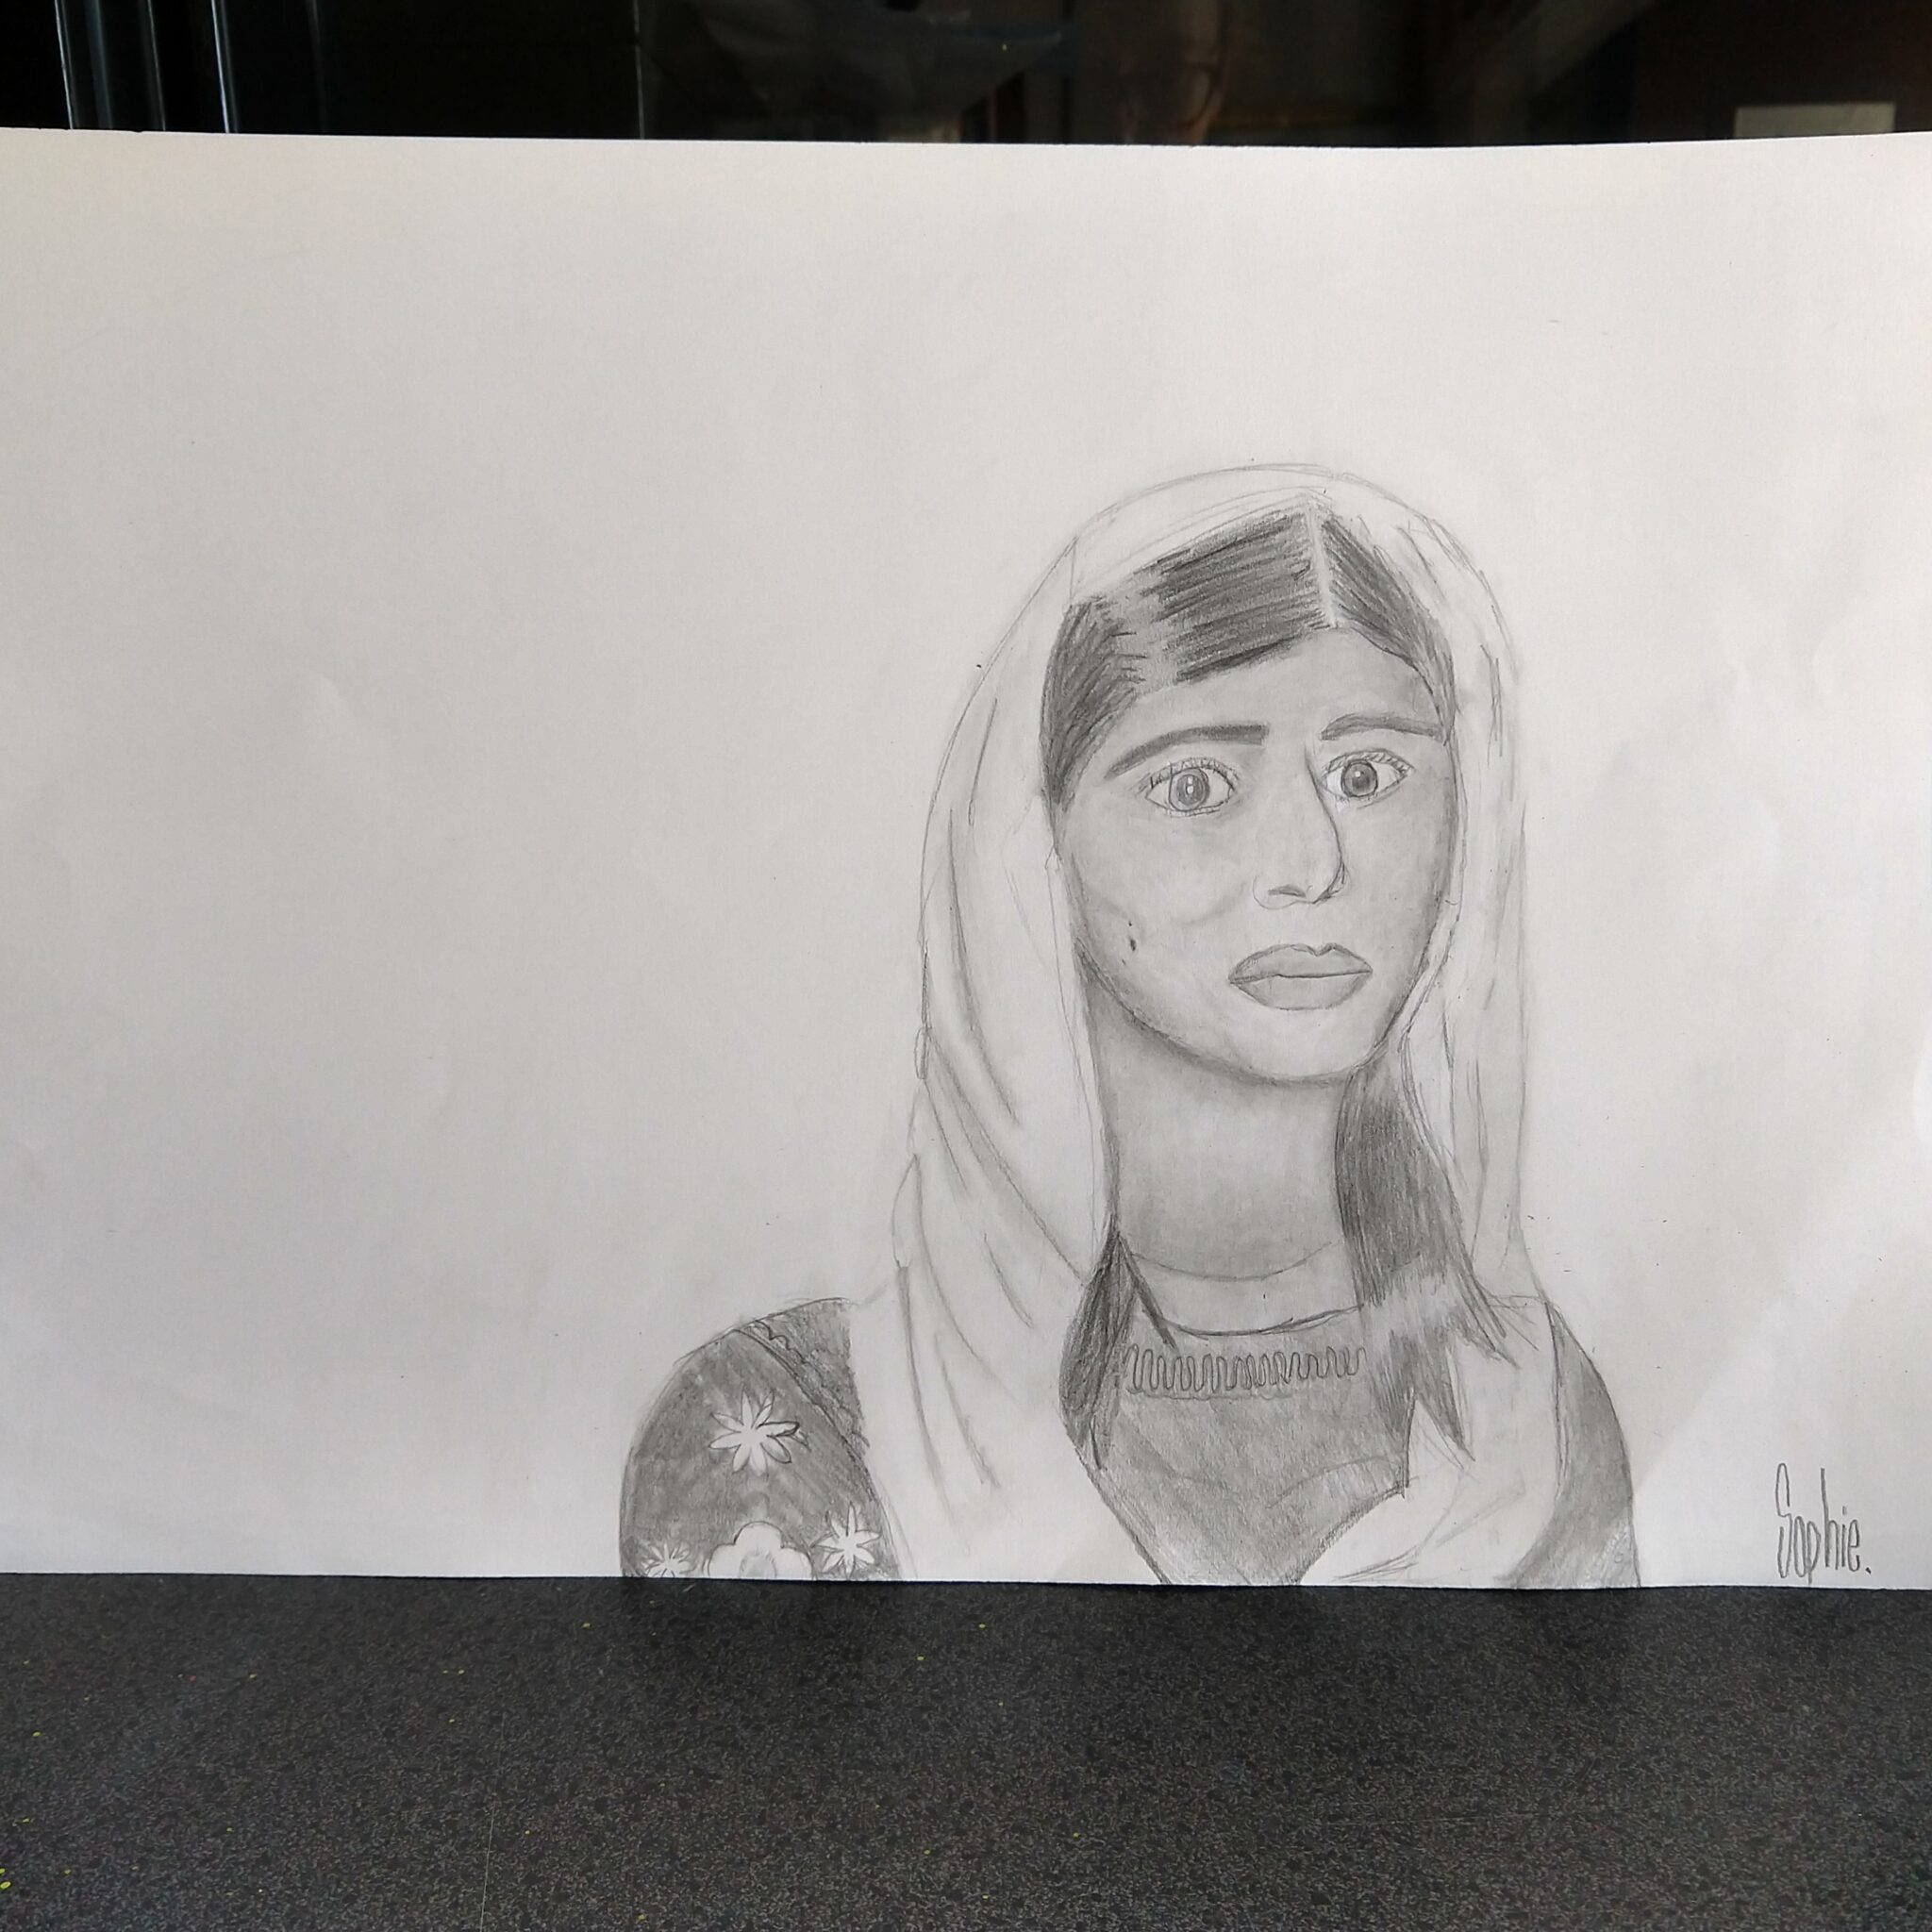 photo of a portrait student artwork